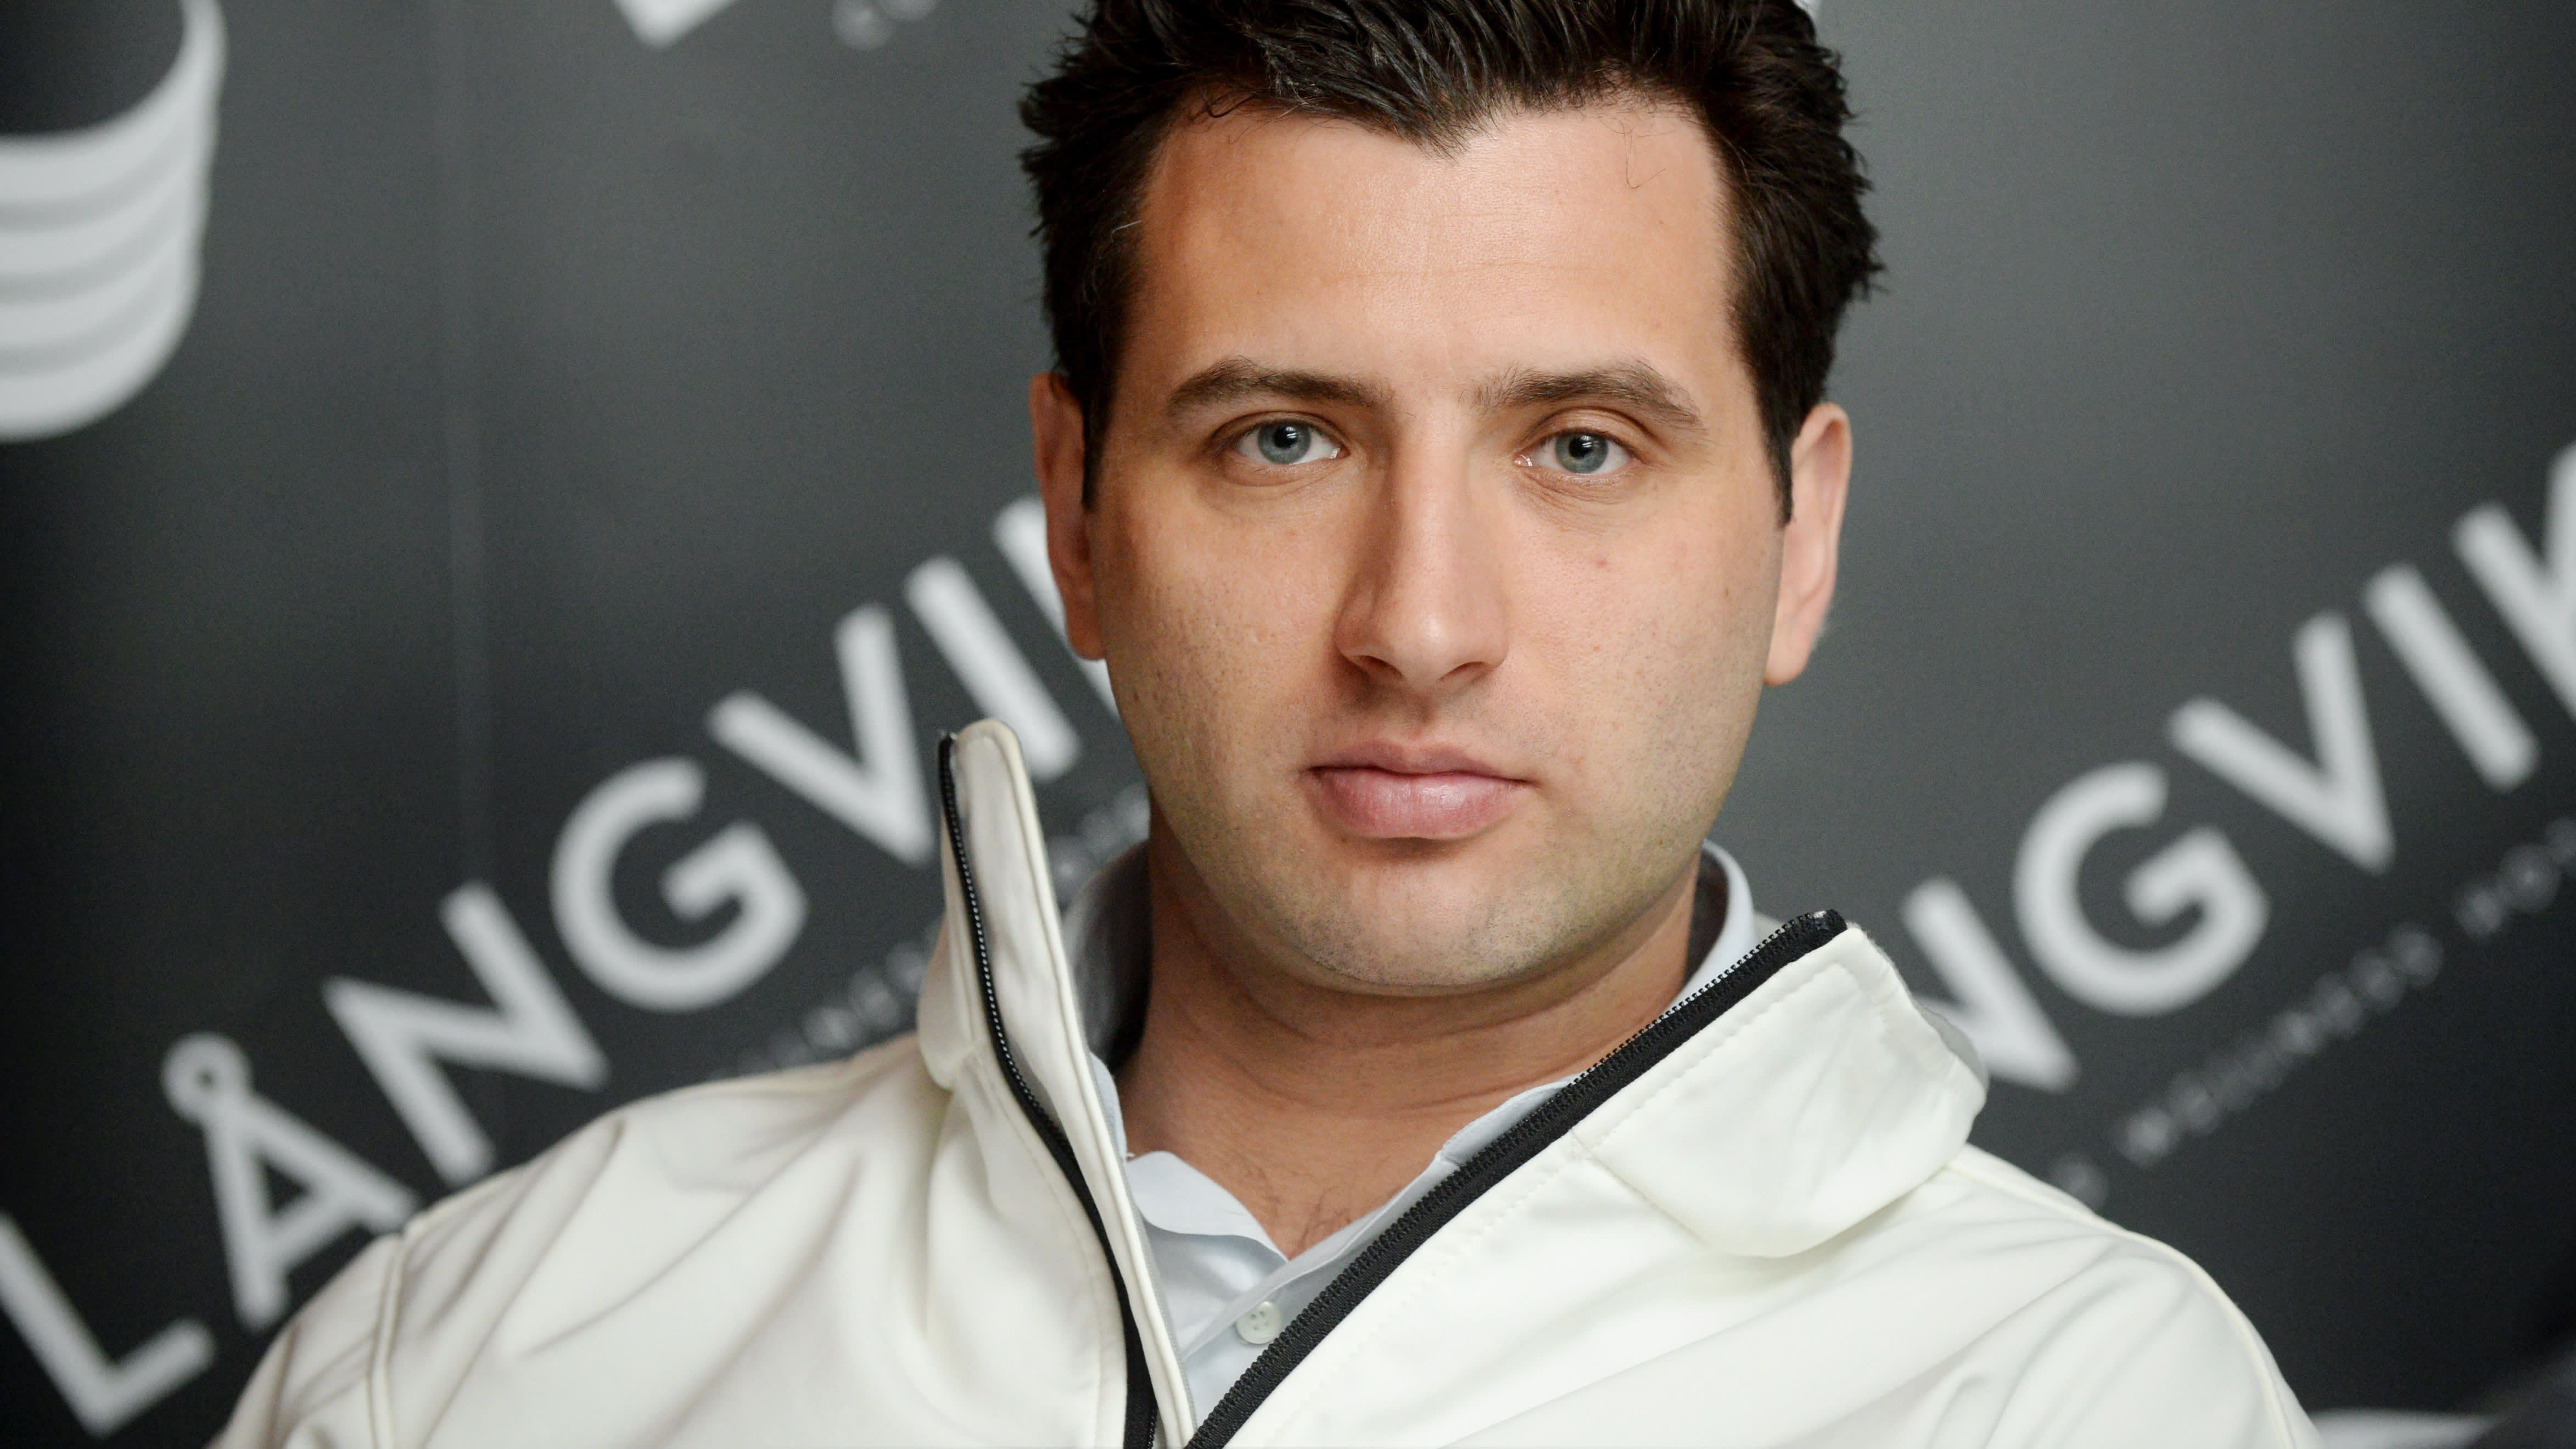 Roman Rotenberg